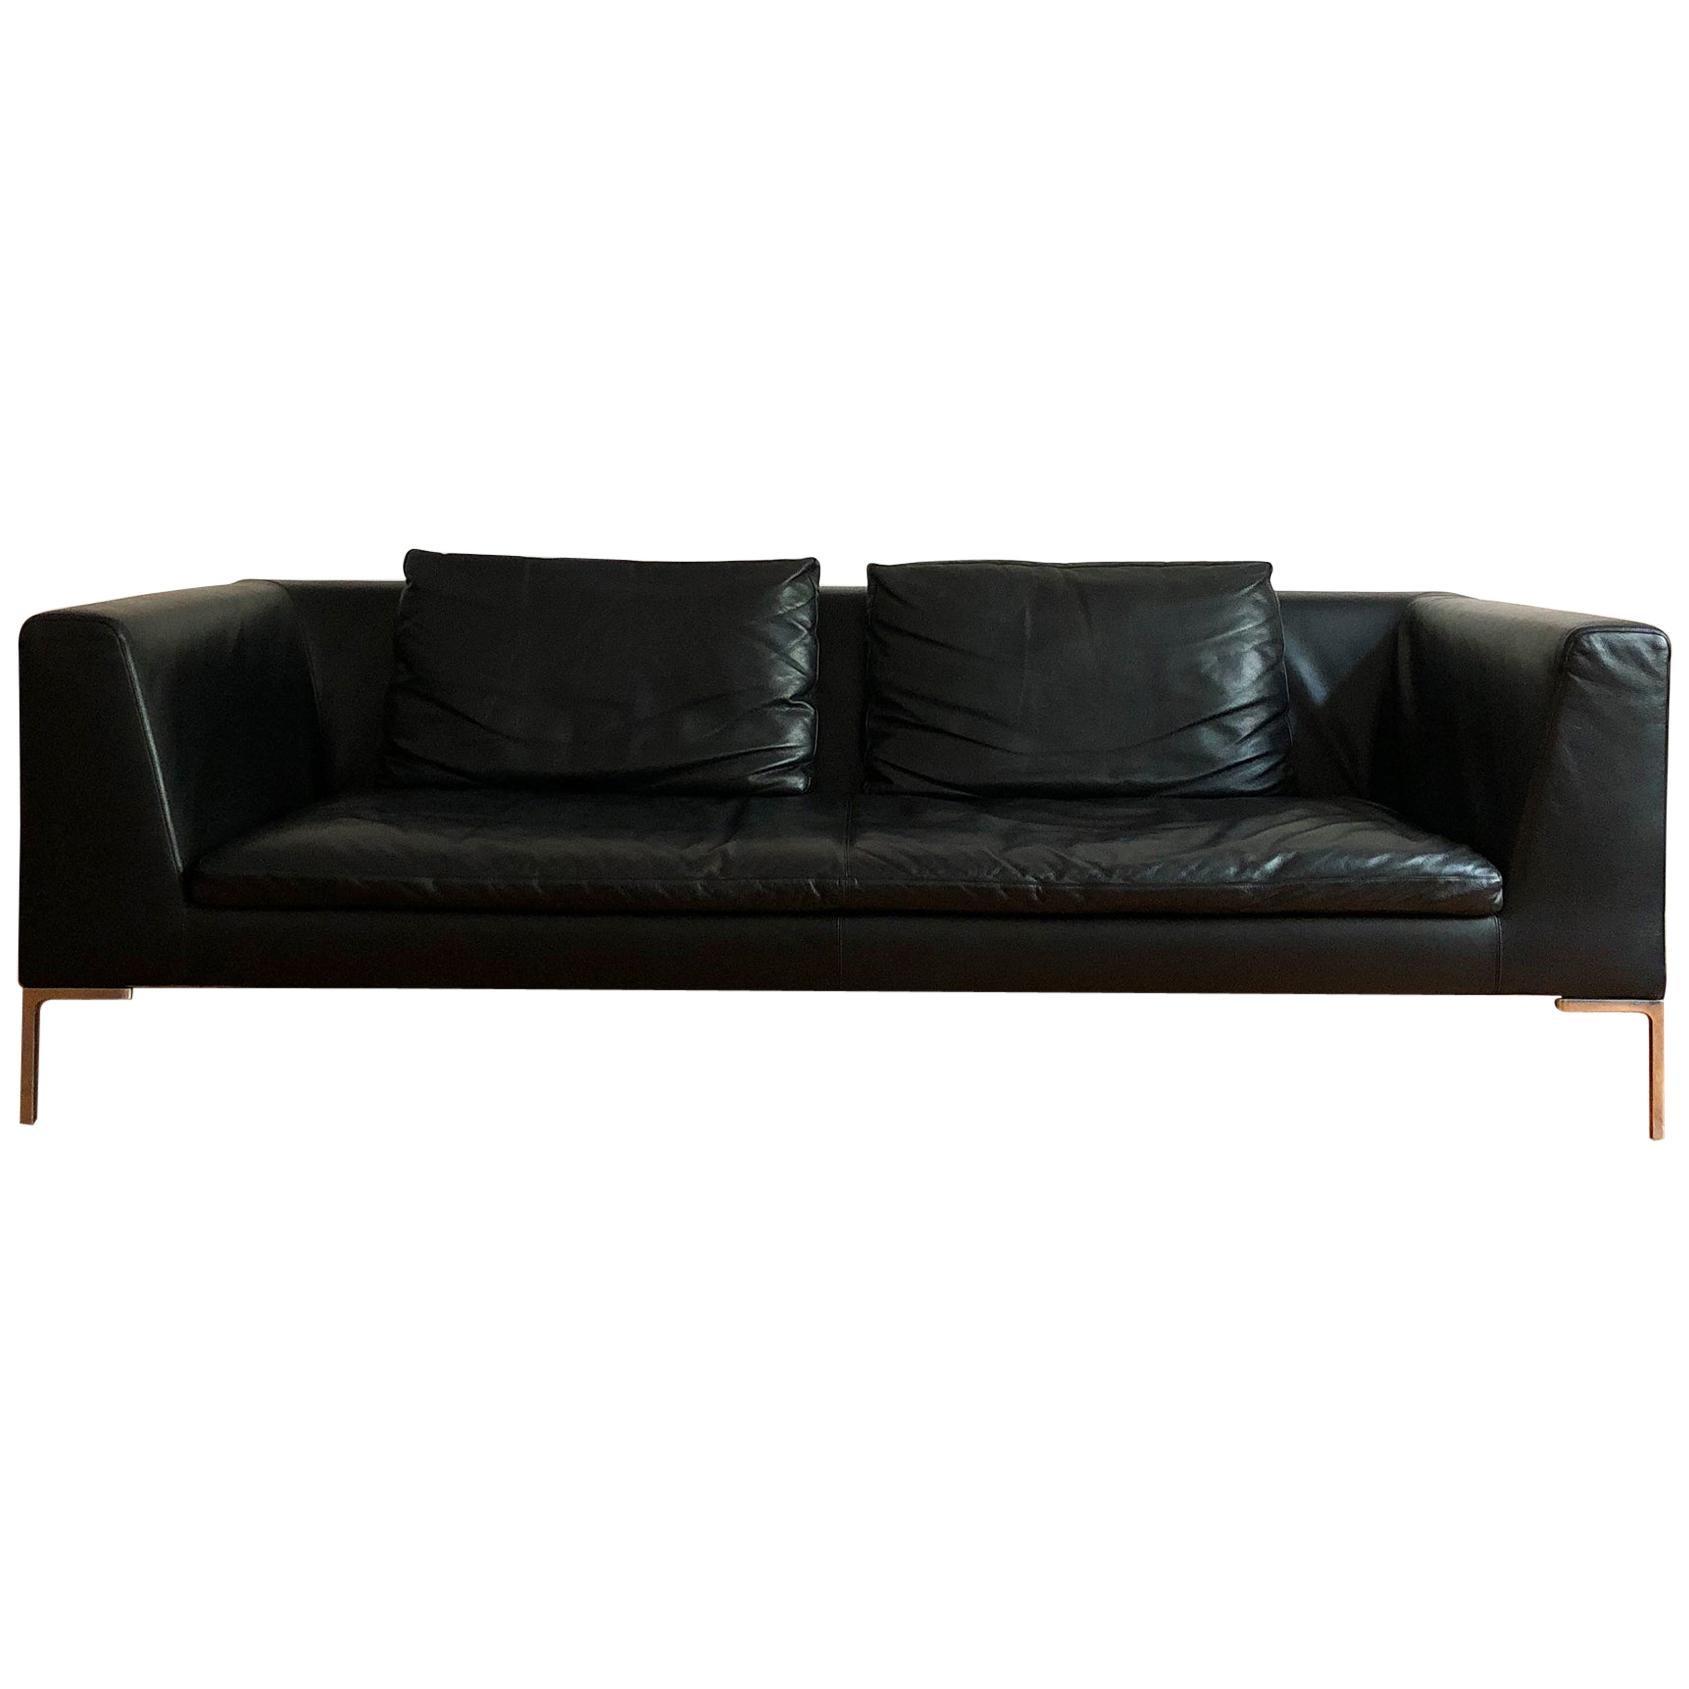 Bon Italian Leather Sofa Model Charles By Antonio Citterio For Bu0026B Italia